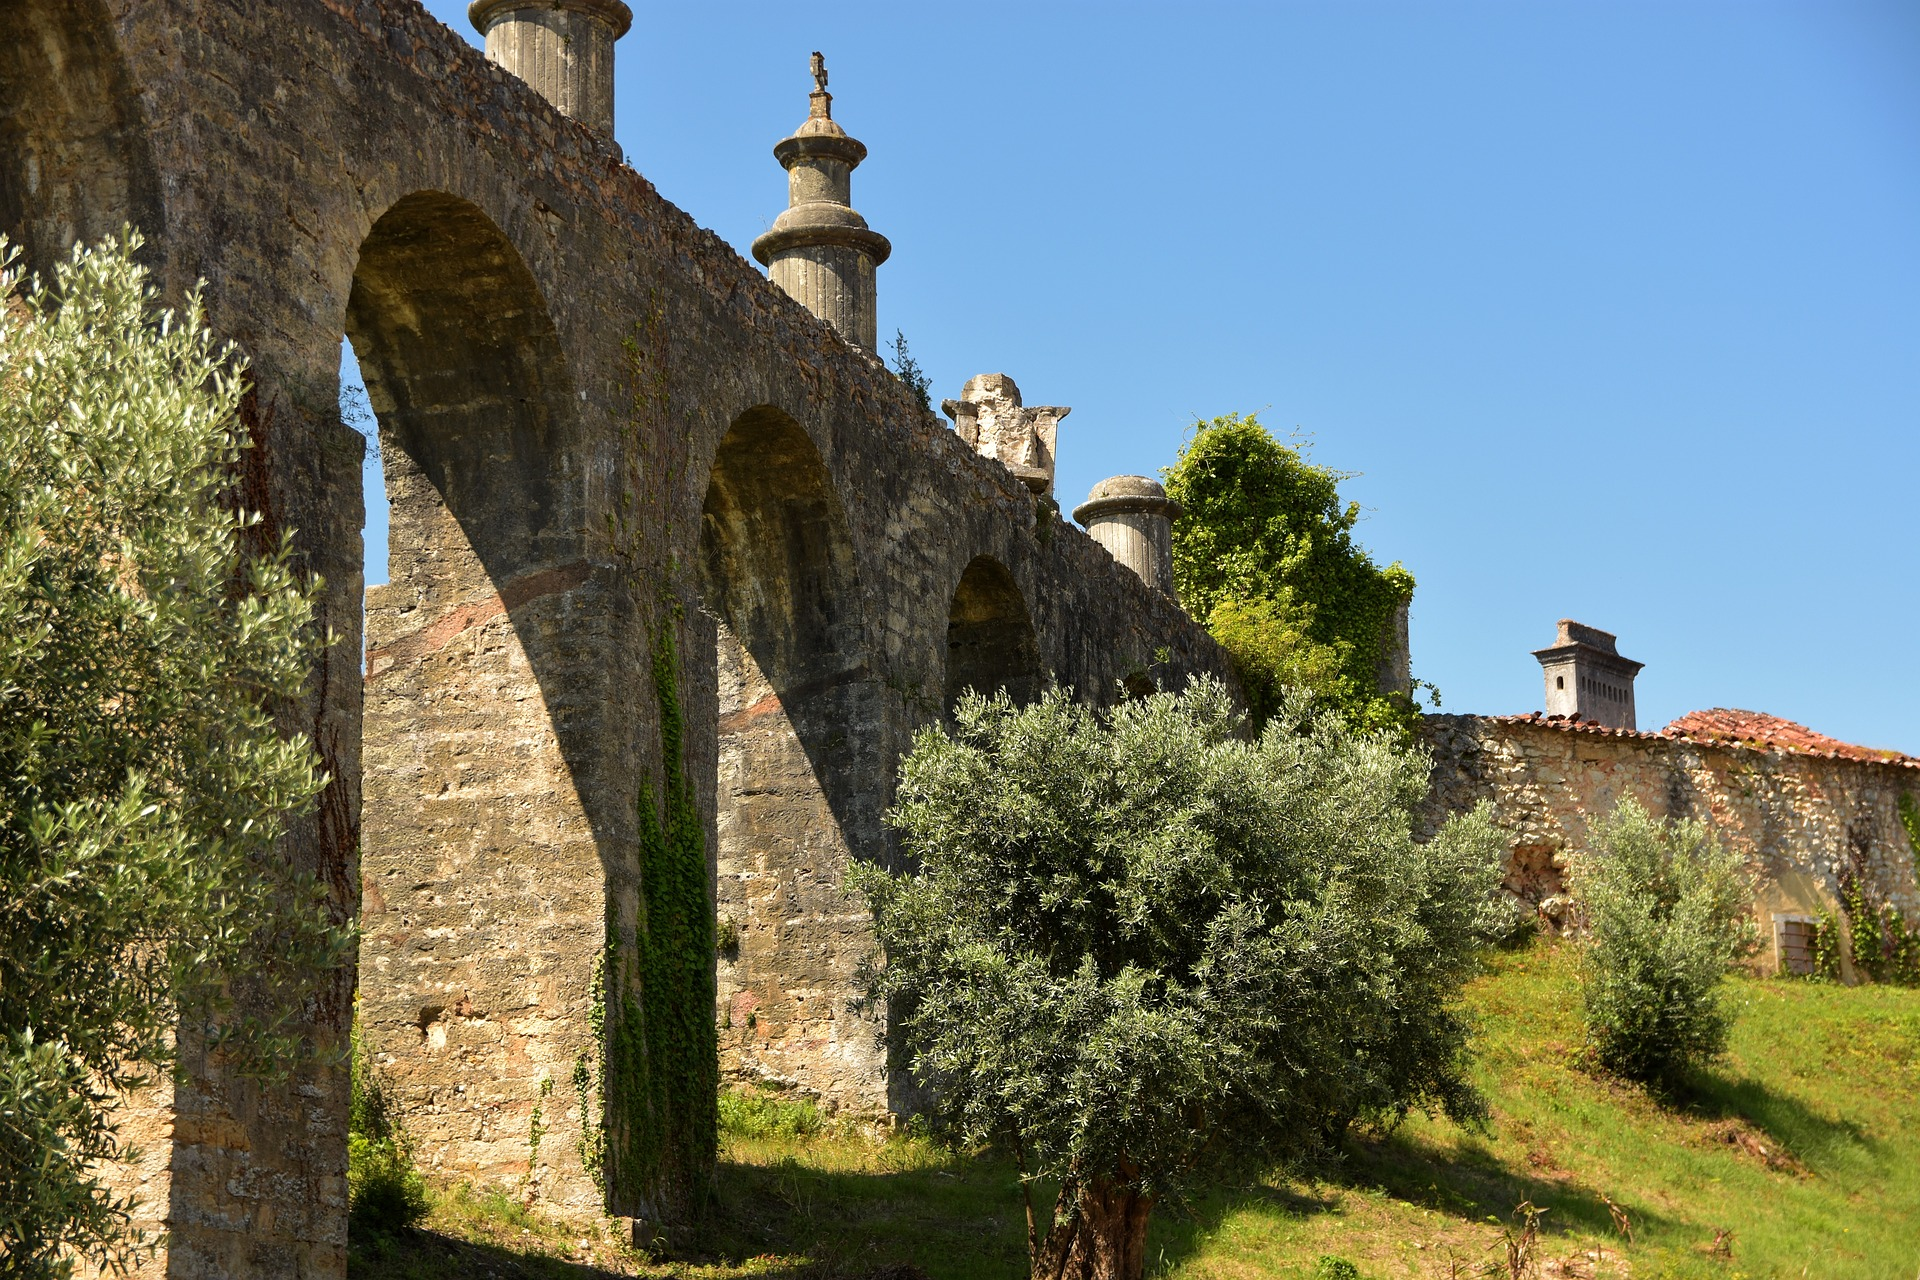 Aqueduct in Tomar, Portugal